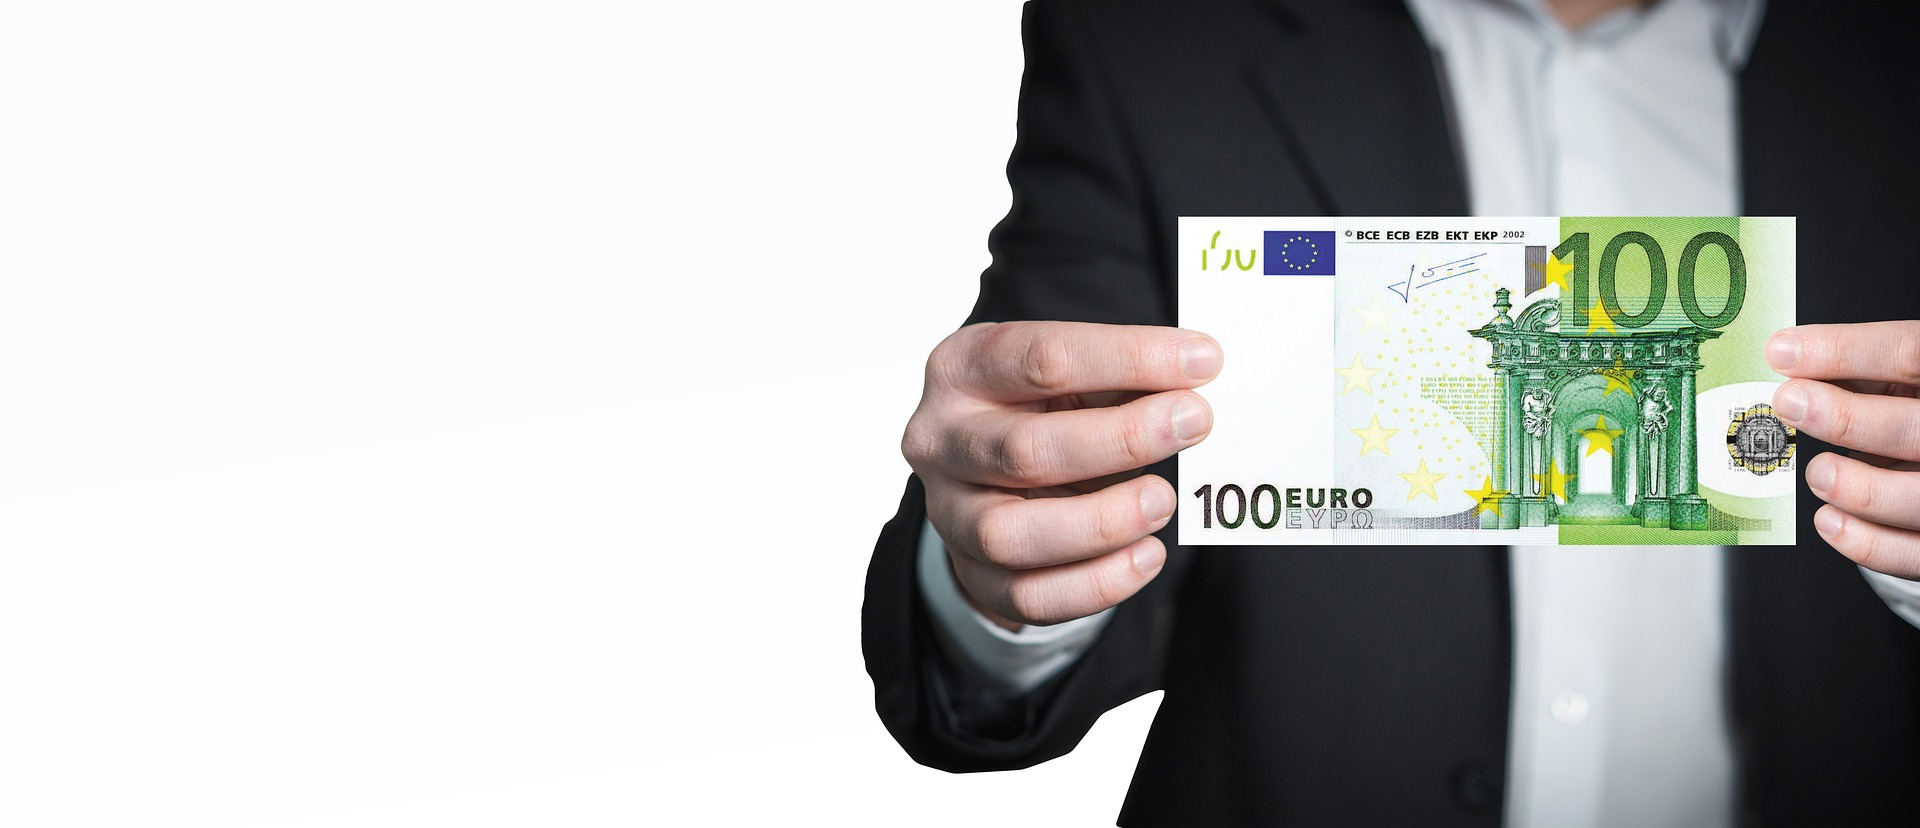 instant paypal payout surveys tax twerk